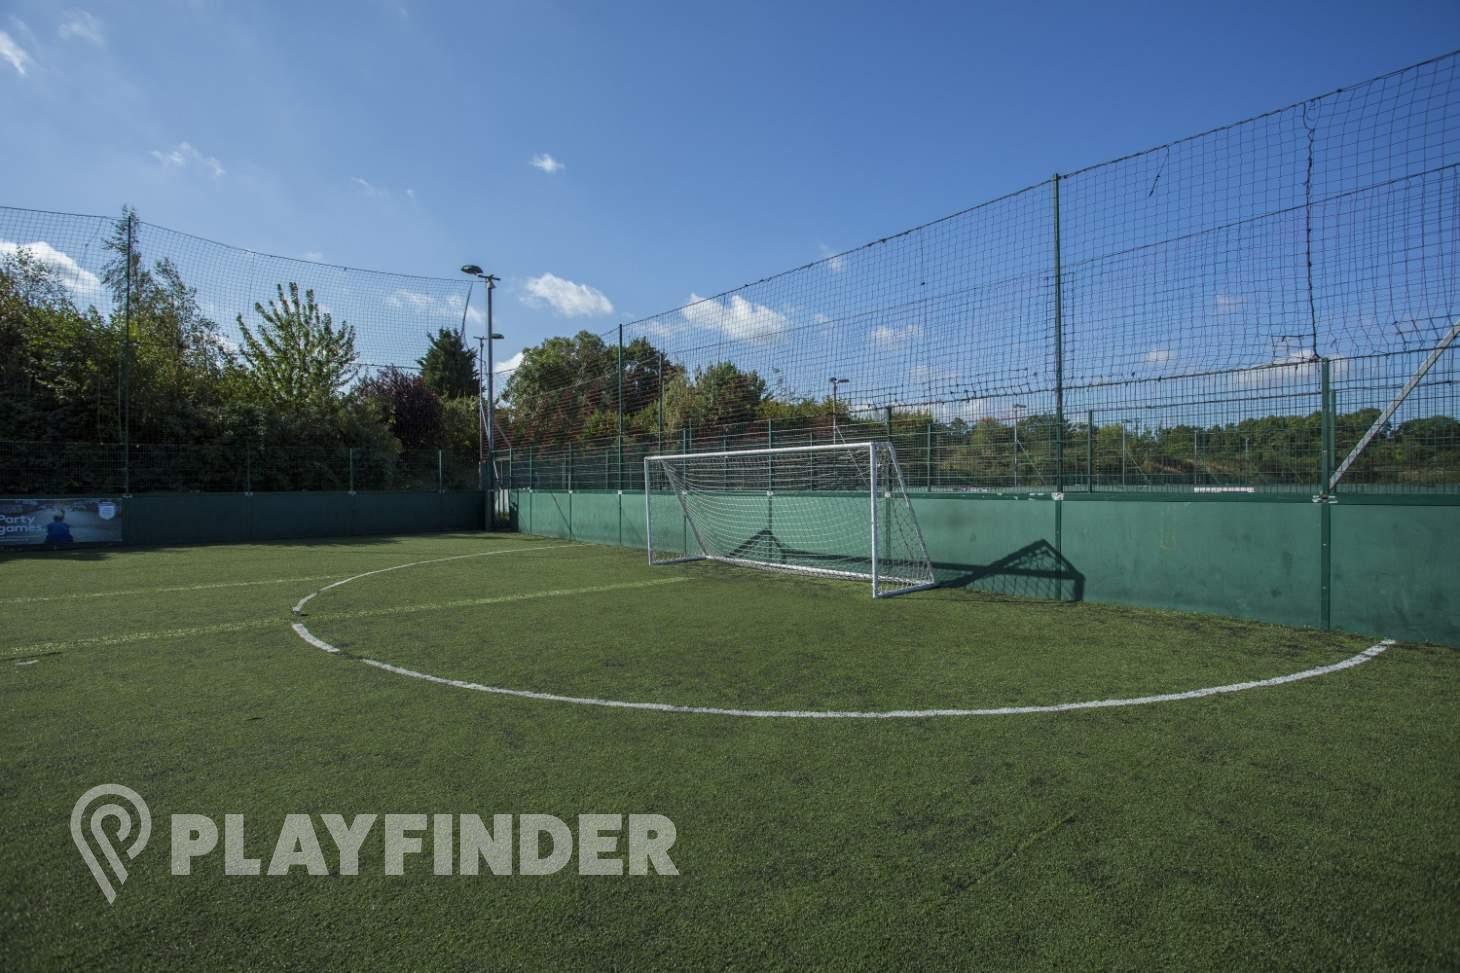 Powerleague Paisley 7 a side | 3G Astroturf football pitch